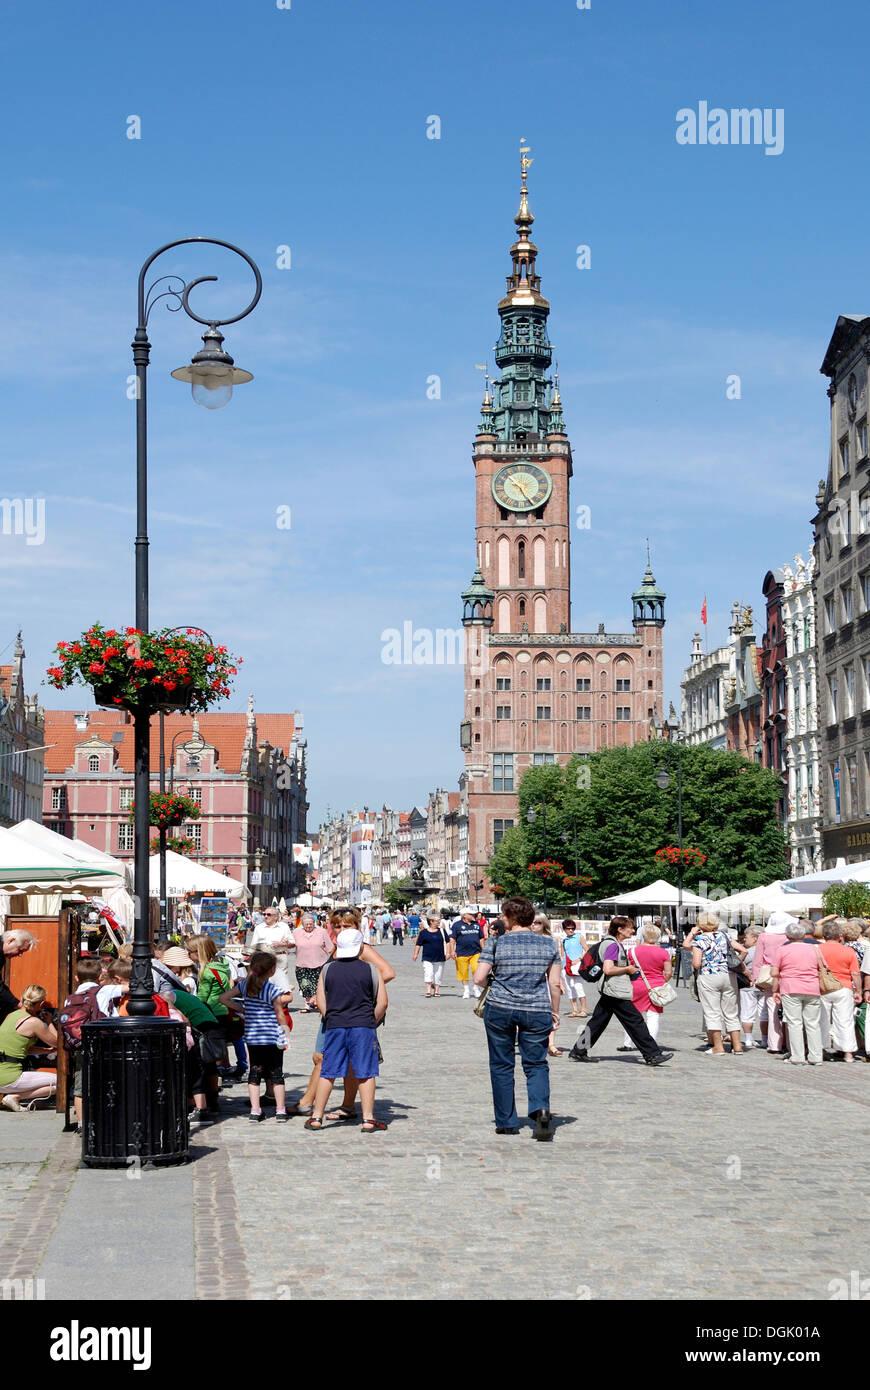 City Hall of Gdansk on the Long Market - Ratusz Glownego Miasta. Stock Photo